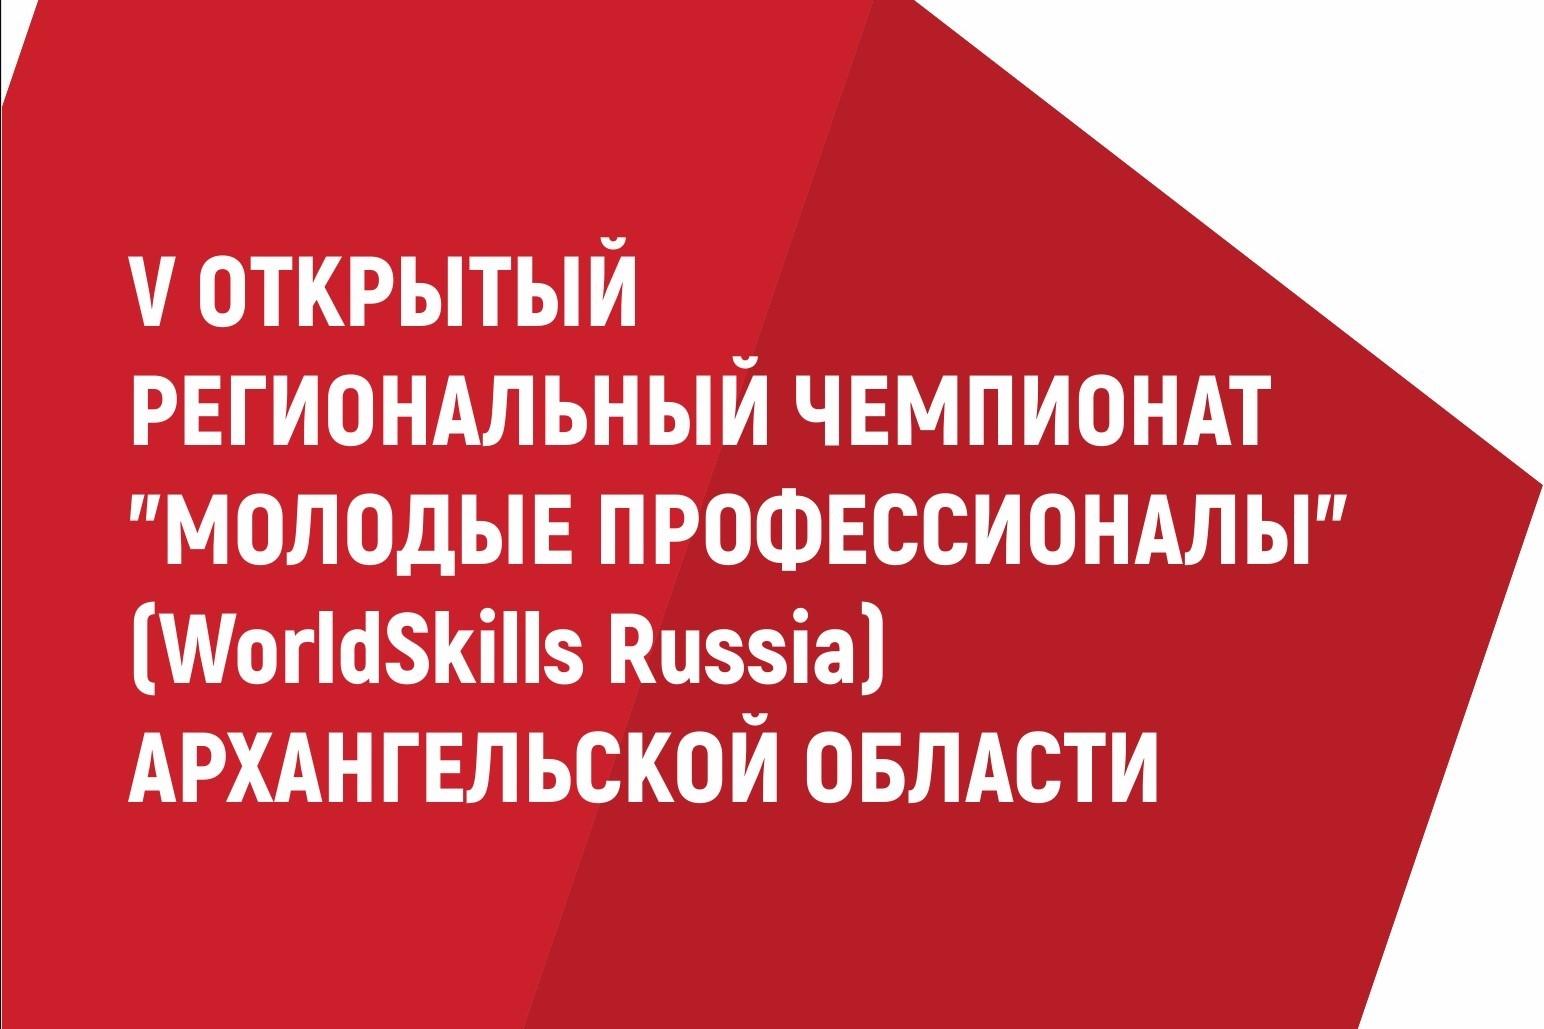 Cкоро стартует V региональный чемпионат «Молодые профессионалы» (Worldskills Russia) Архангельской области